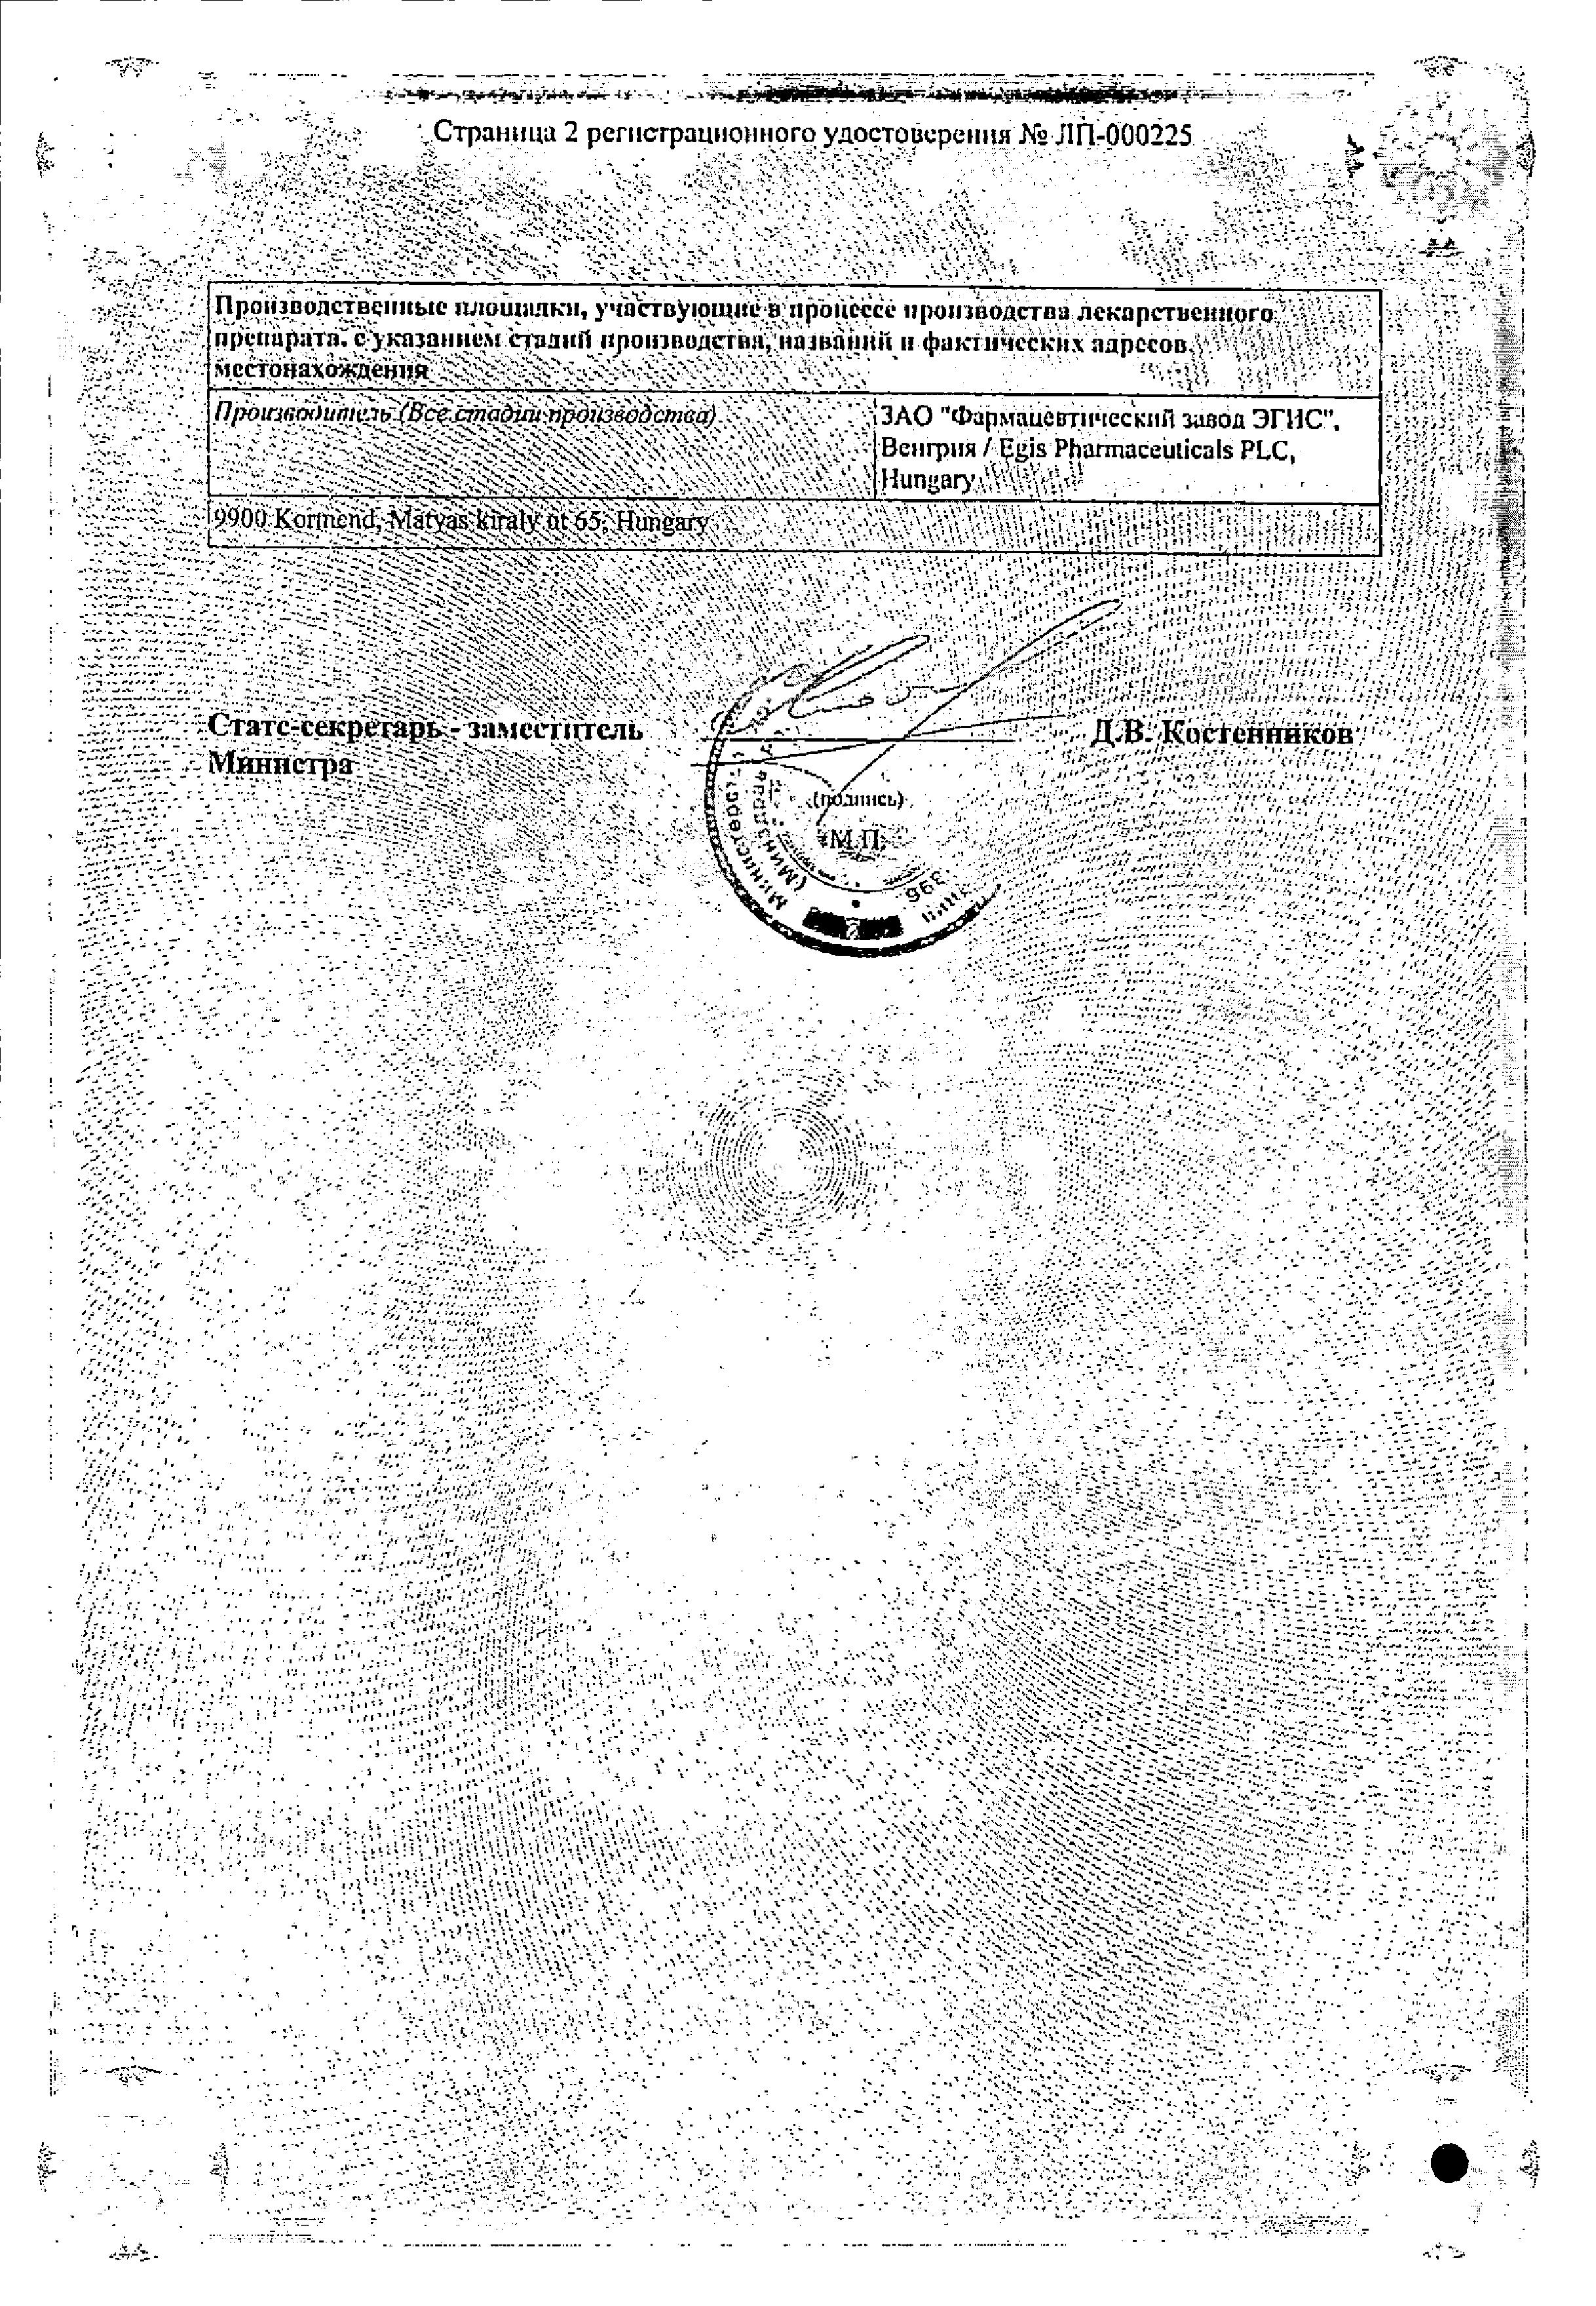 Супрастинекс